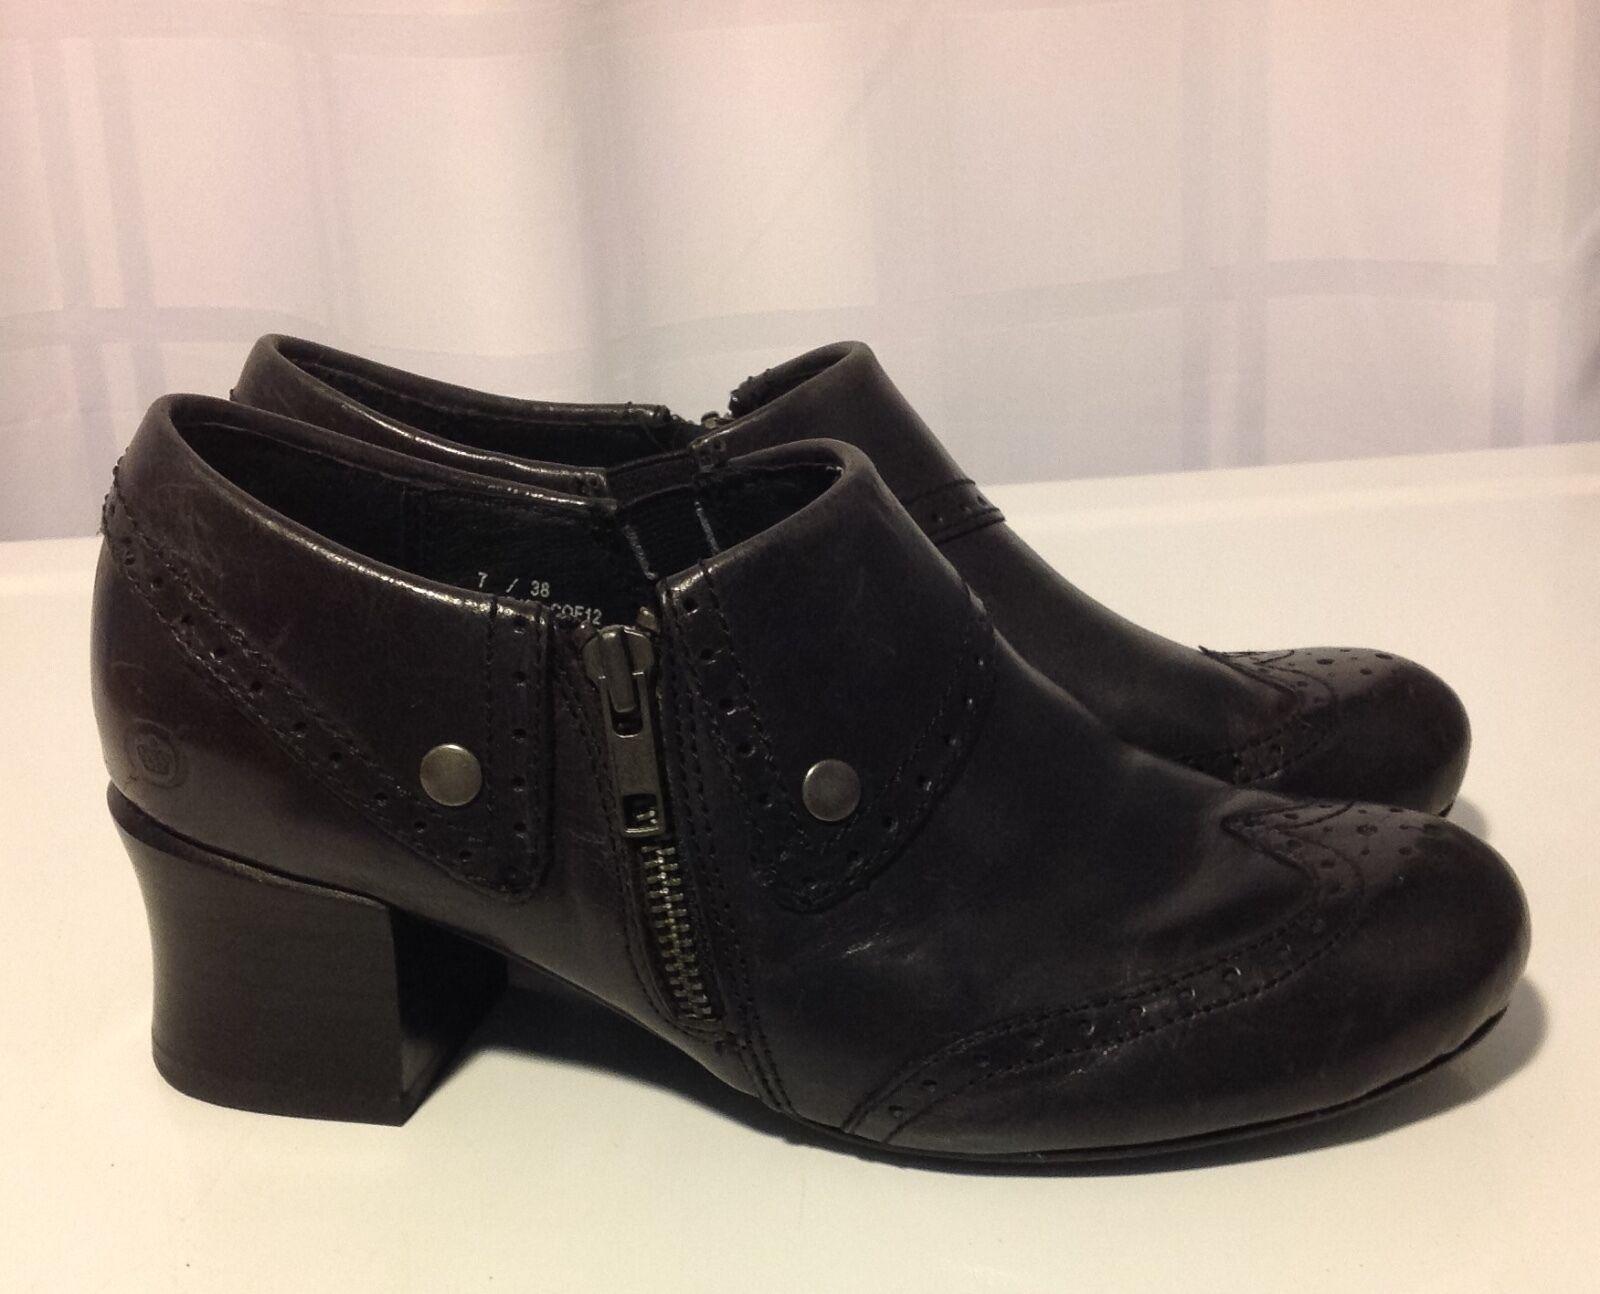 BORN Womens SIZE  7 M shoes Black Leather Platform Wedge Mules Clogs